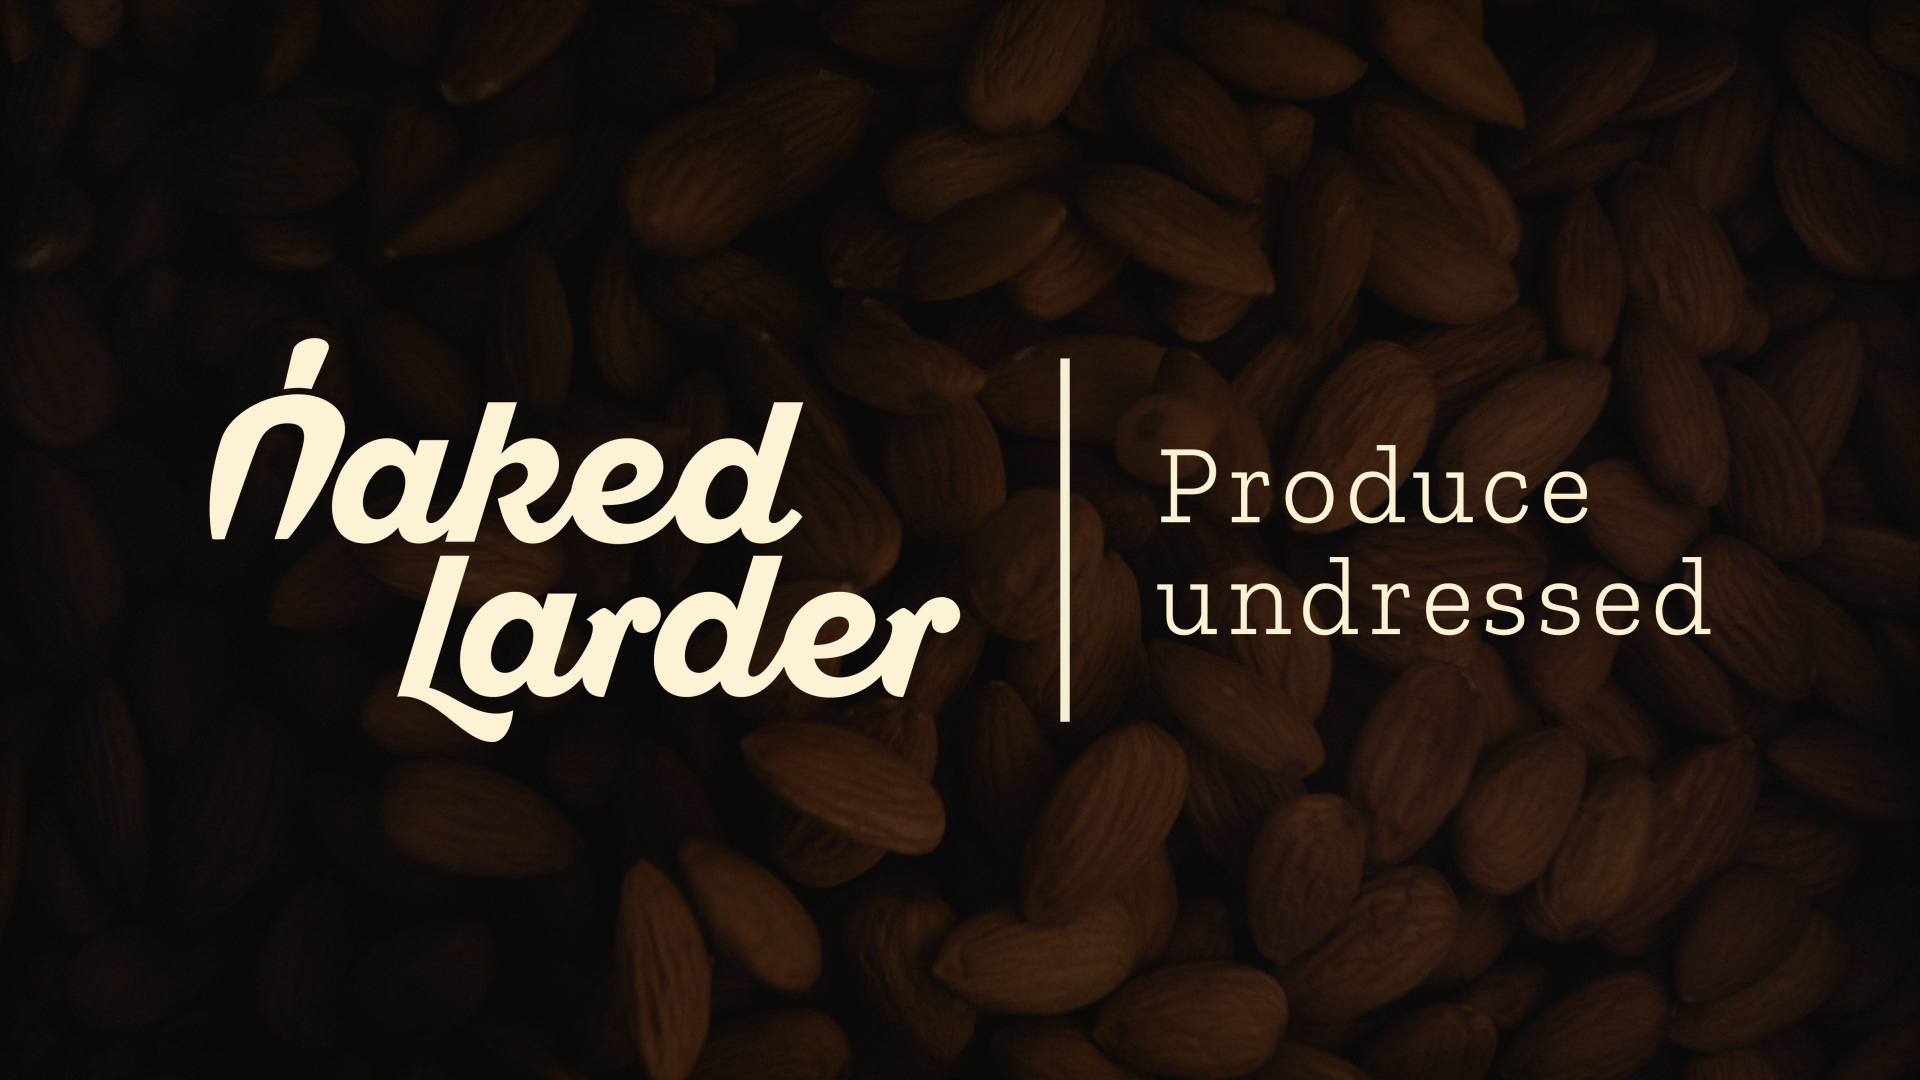 Naked Larder